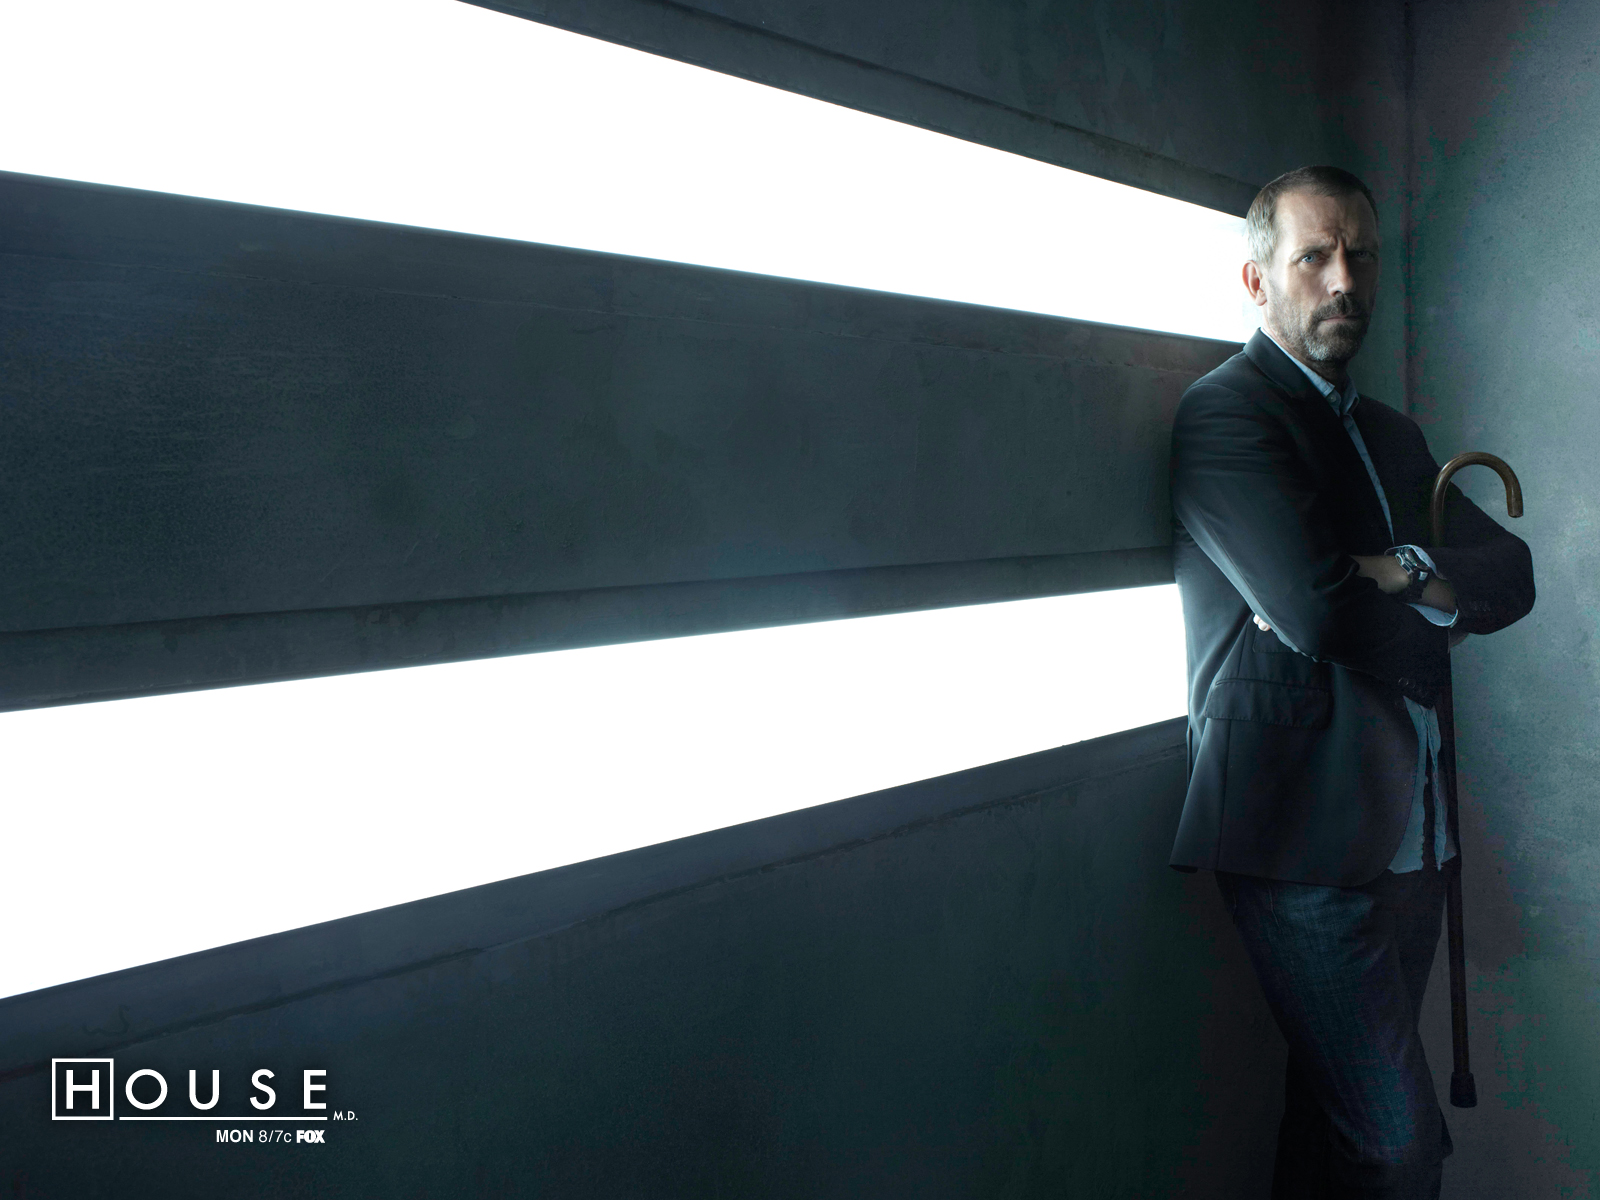 Download full size HouseWall House M.D. wallpaper / 1600x1200